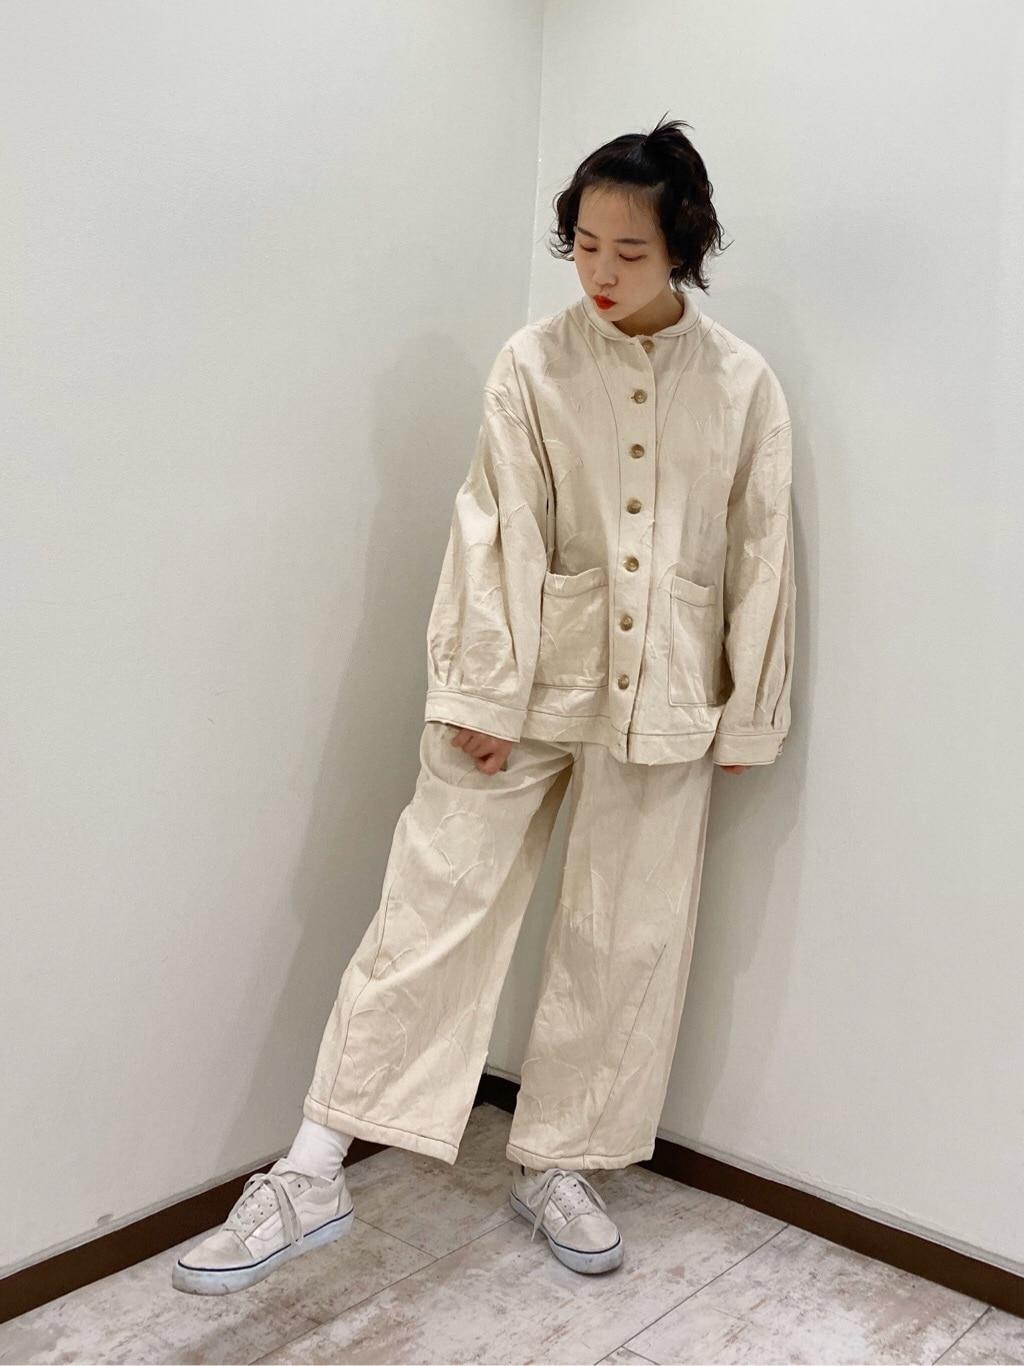 l'atelier du savon 新宿ミロード 身長:159cm 2020.04.08